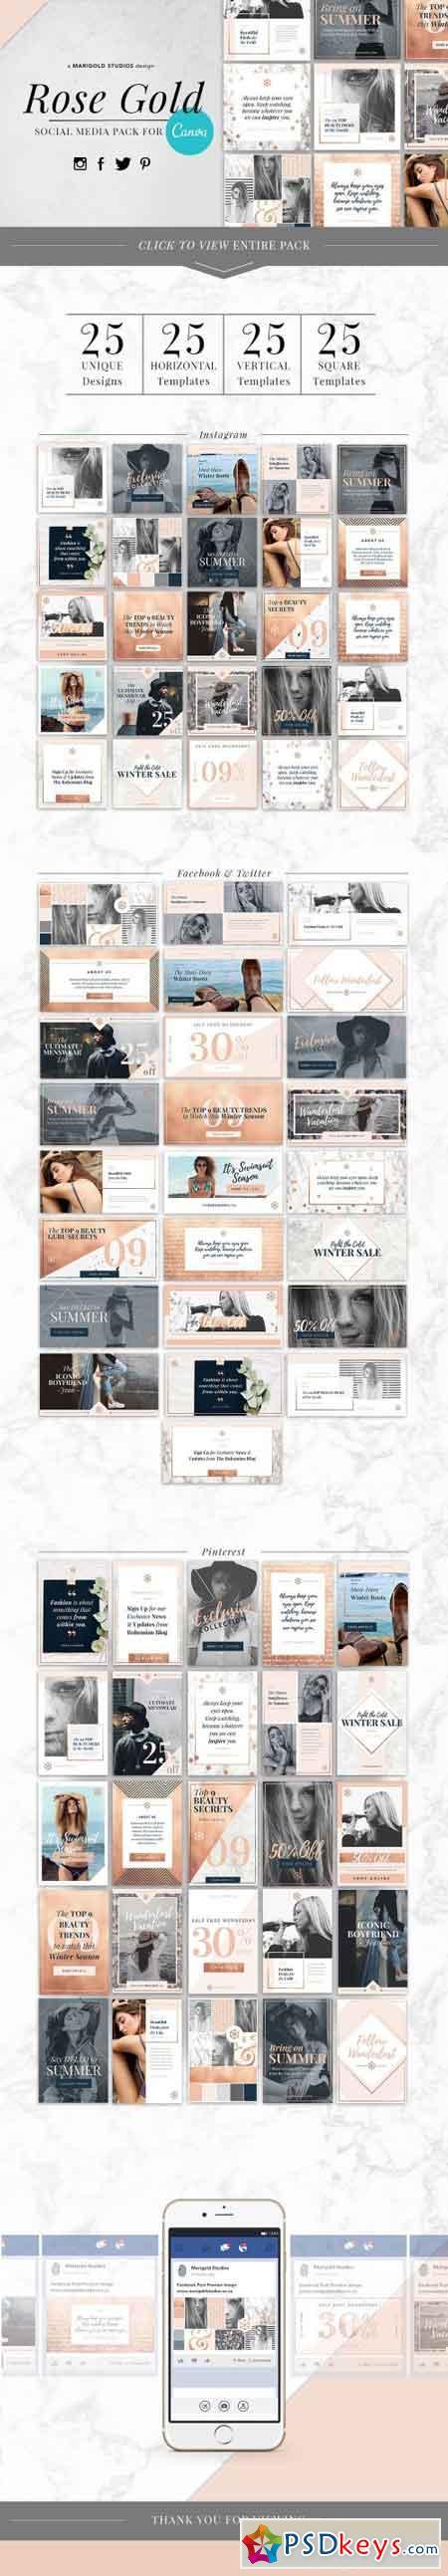 CANVA Rose Gold Social Media Pack 1602012